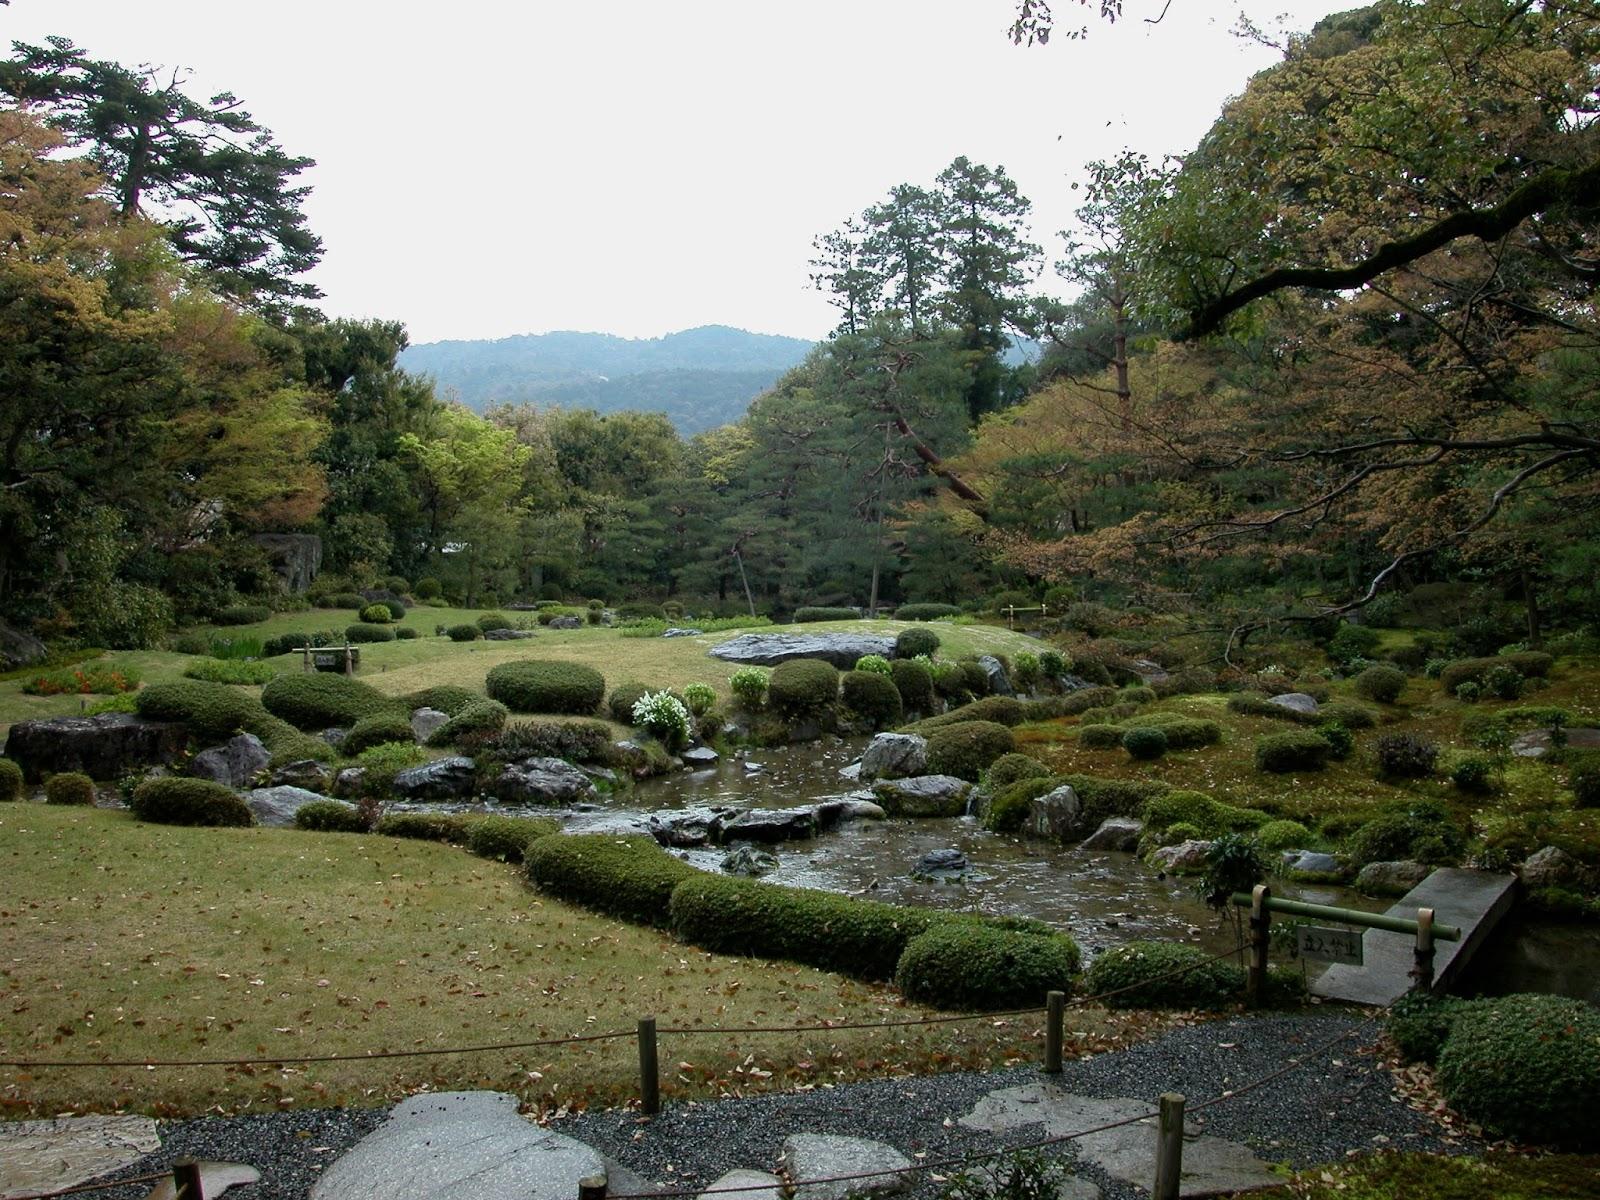 Robert Ketchell39s Blog Borrowed Landscapes Shakkei